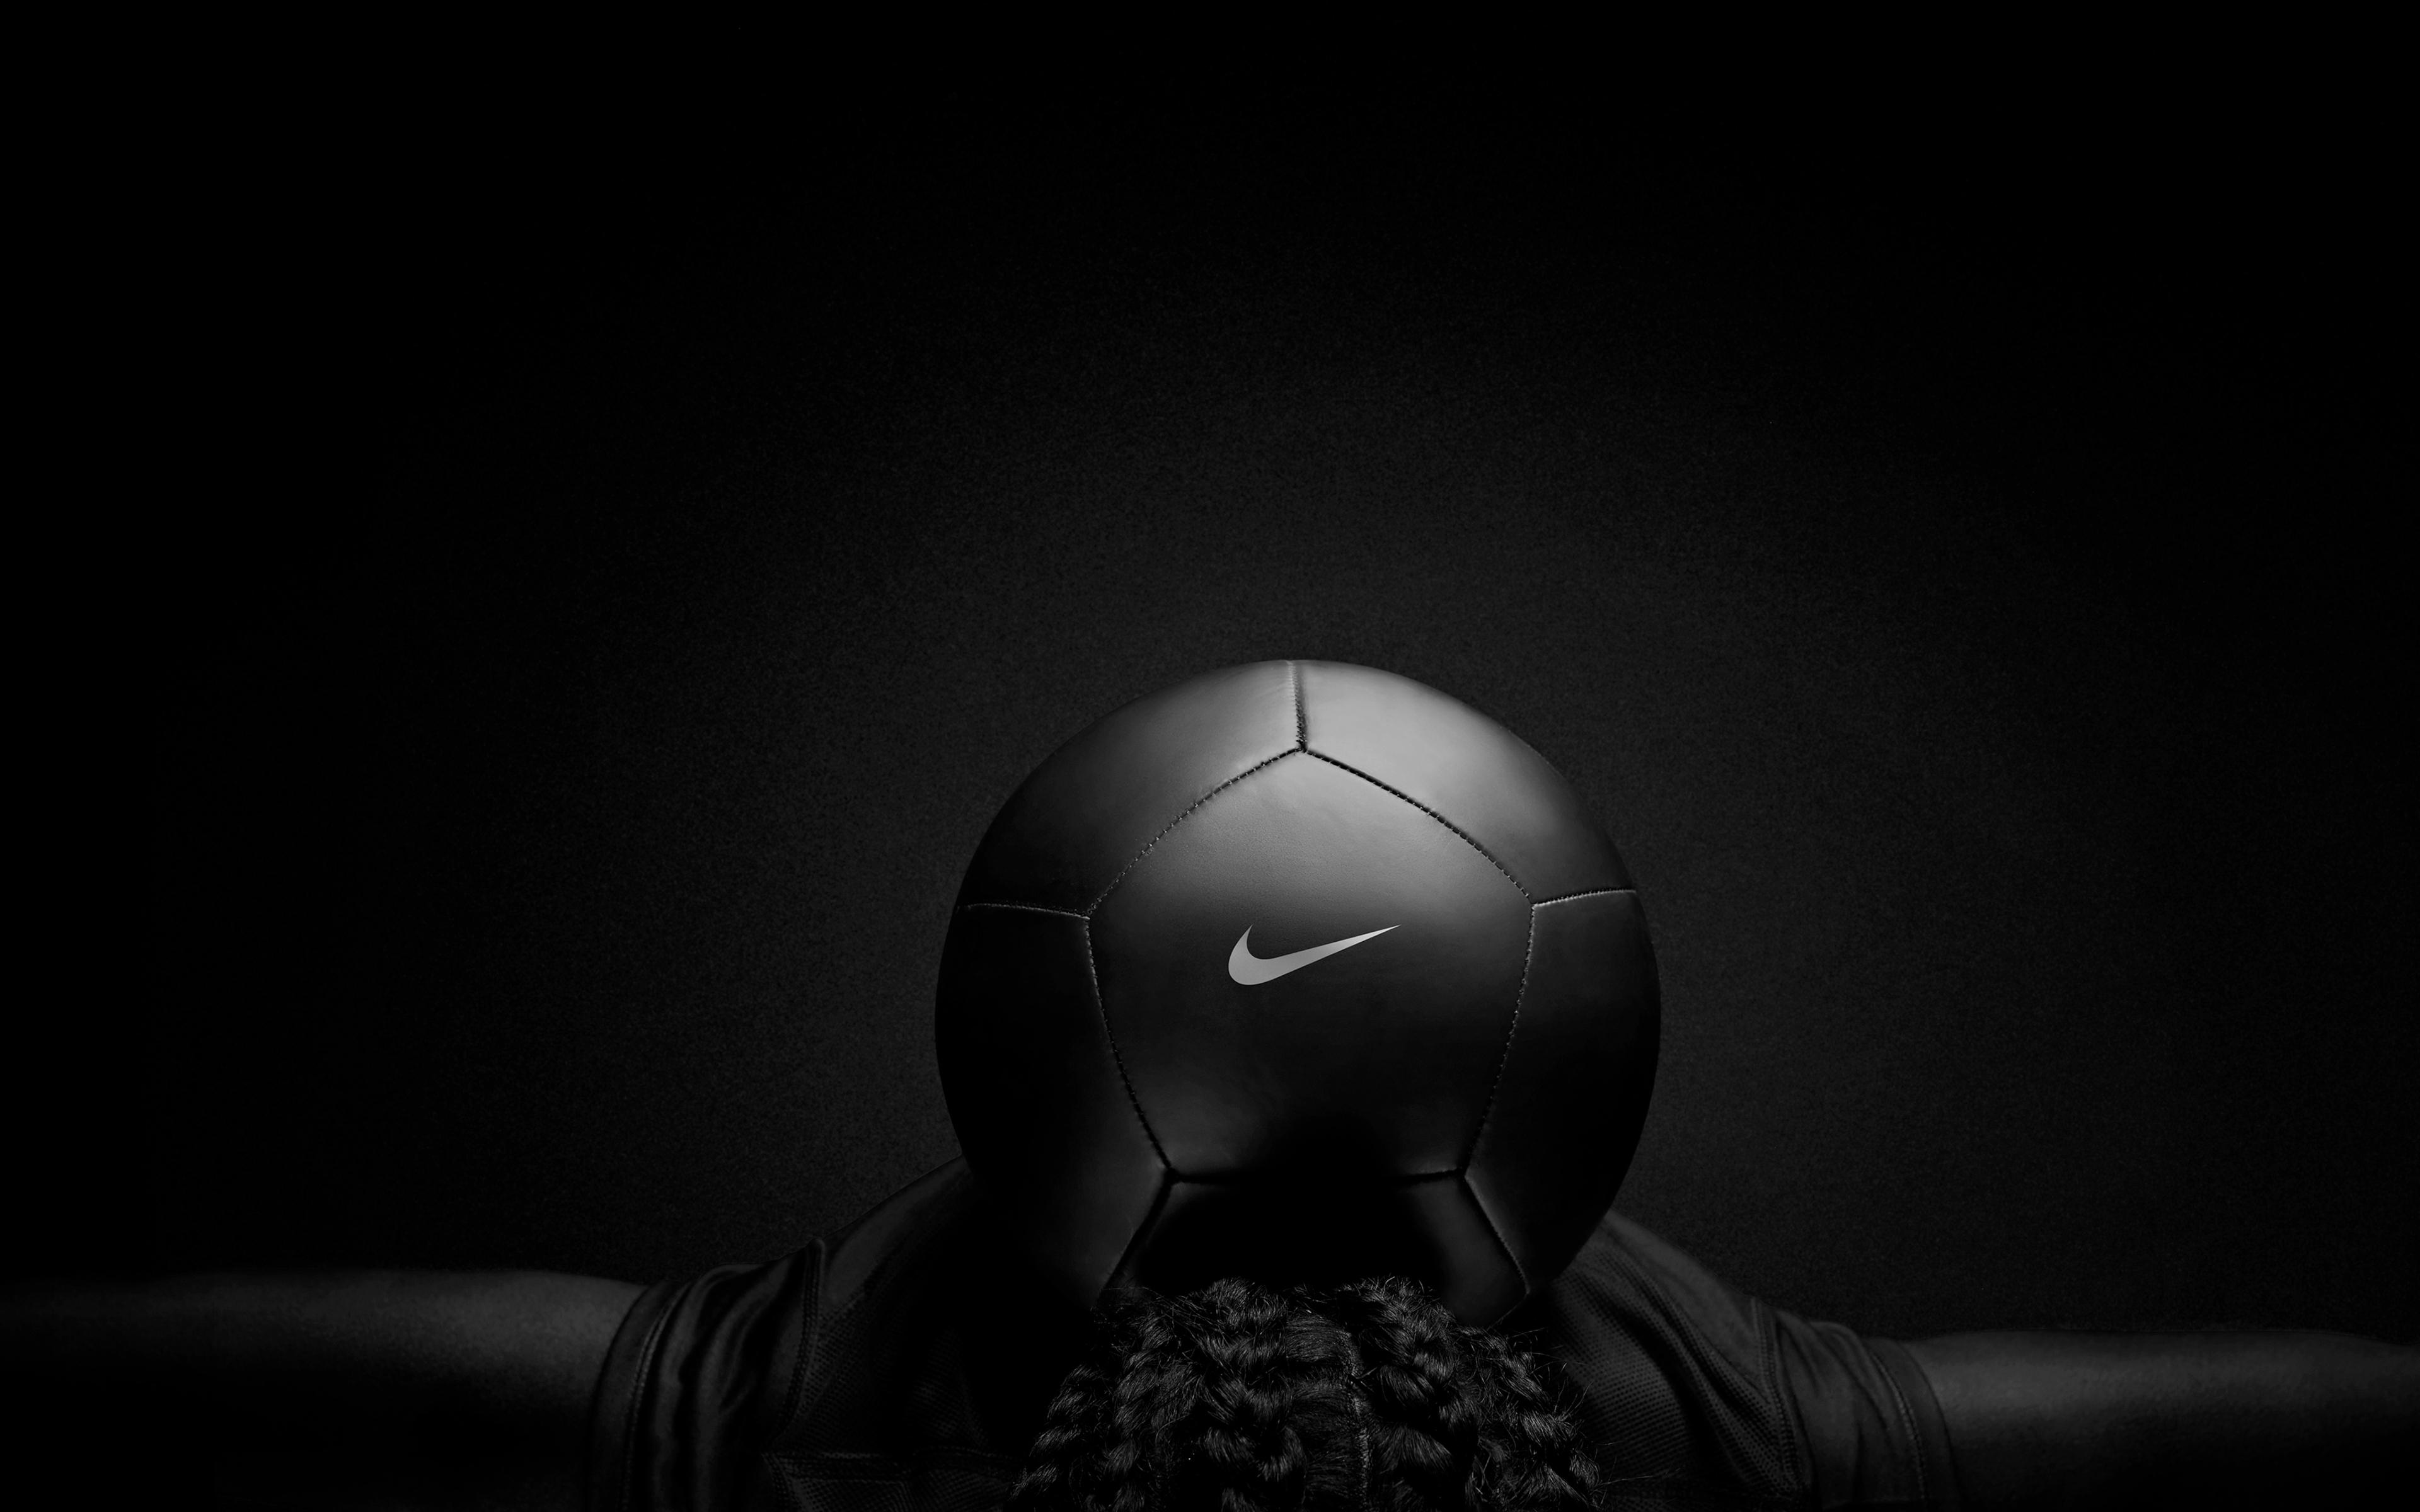 3840x2400 Nike Black Play Football 4k HD 4k Wallpapers ...